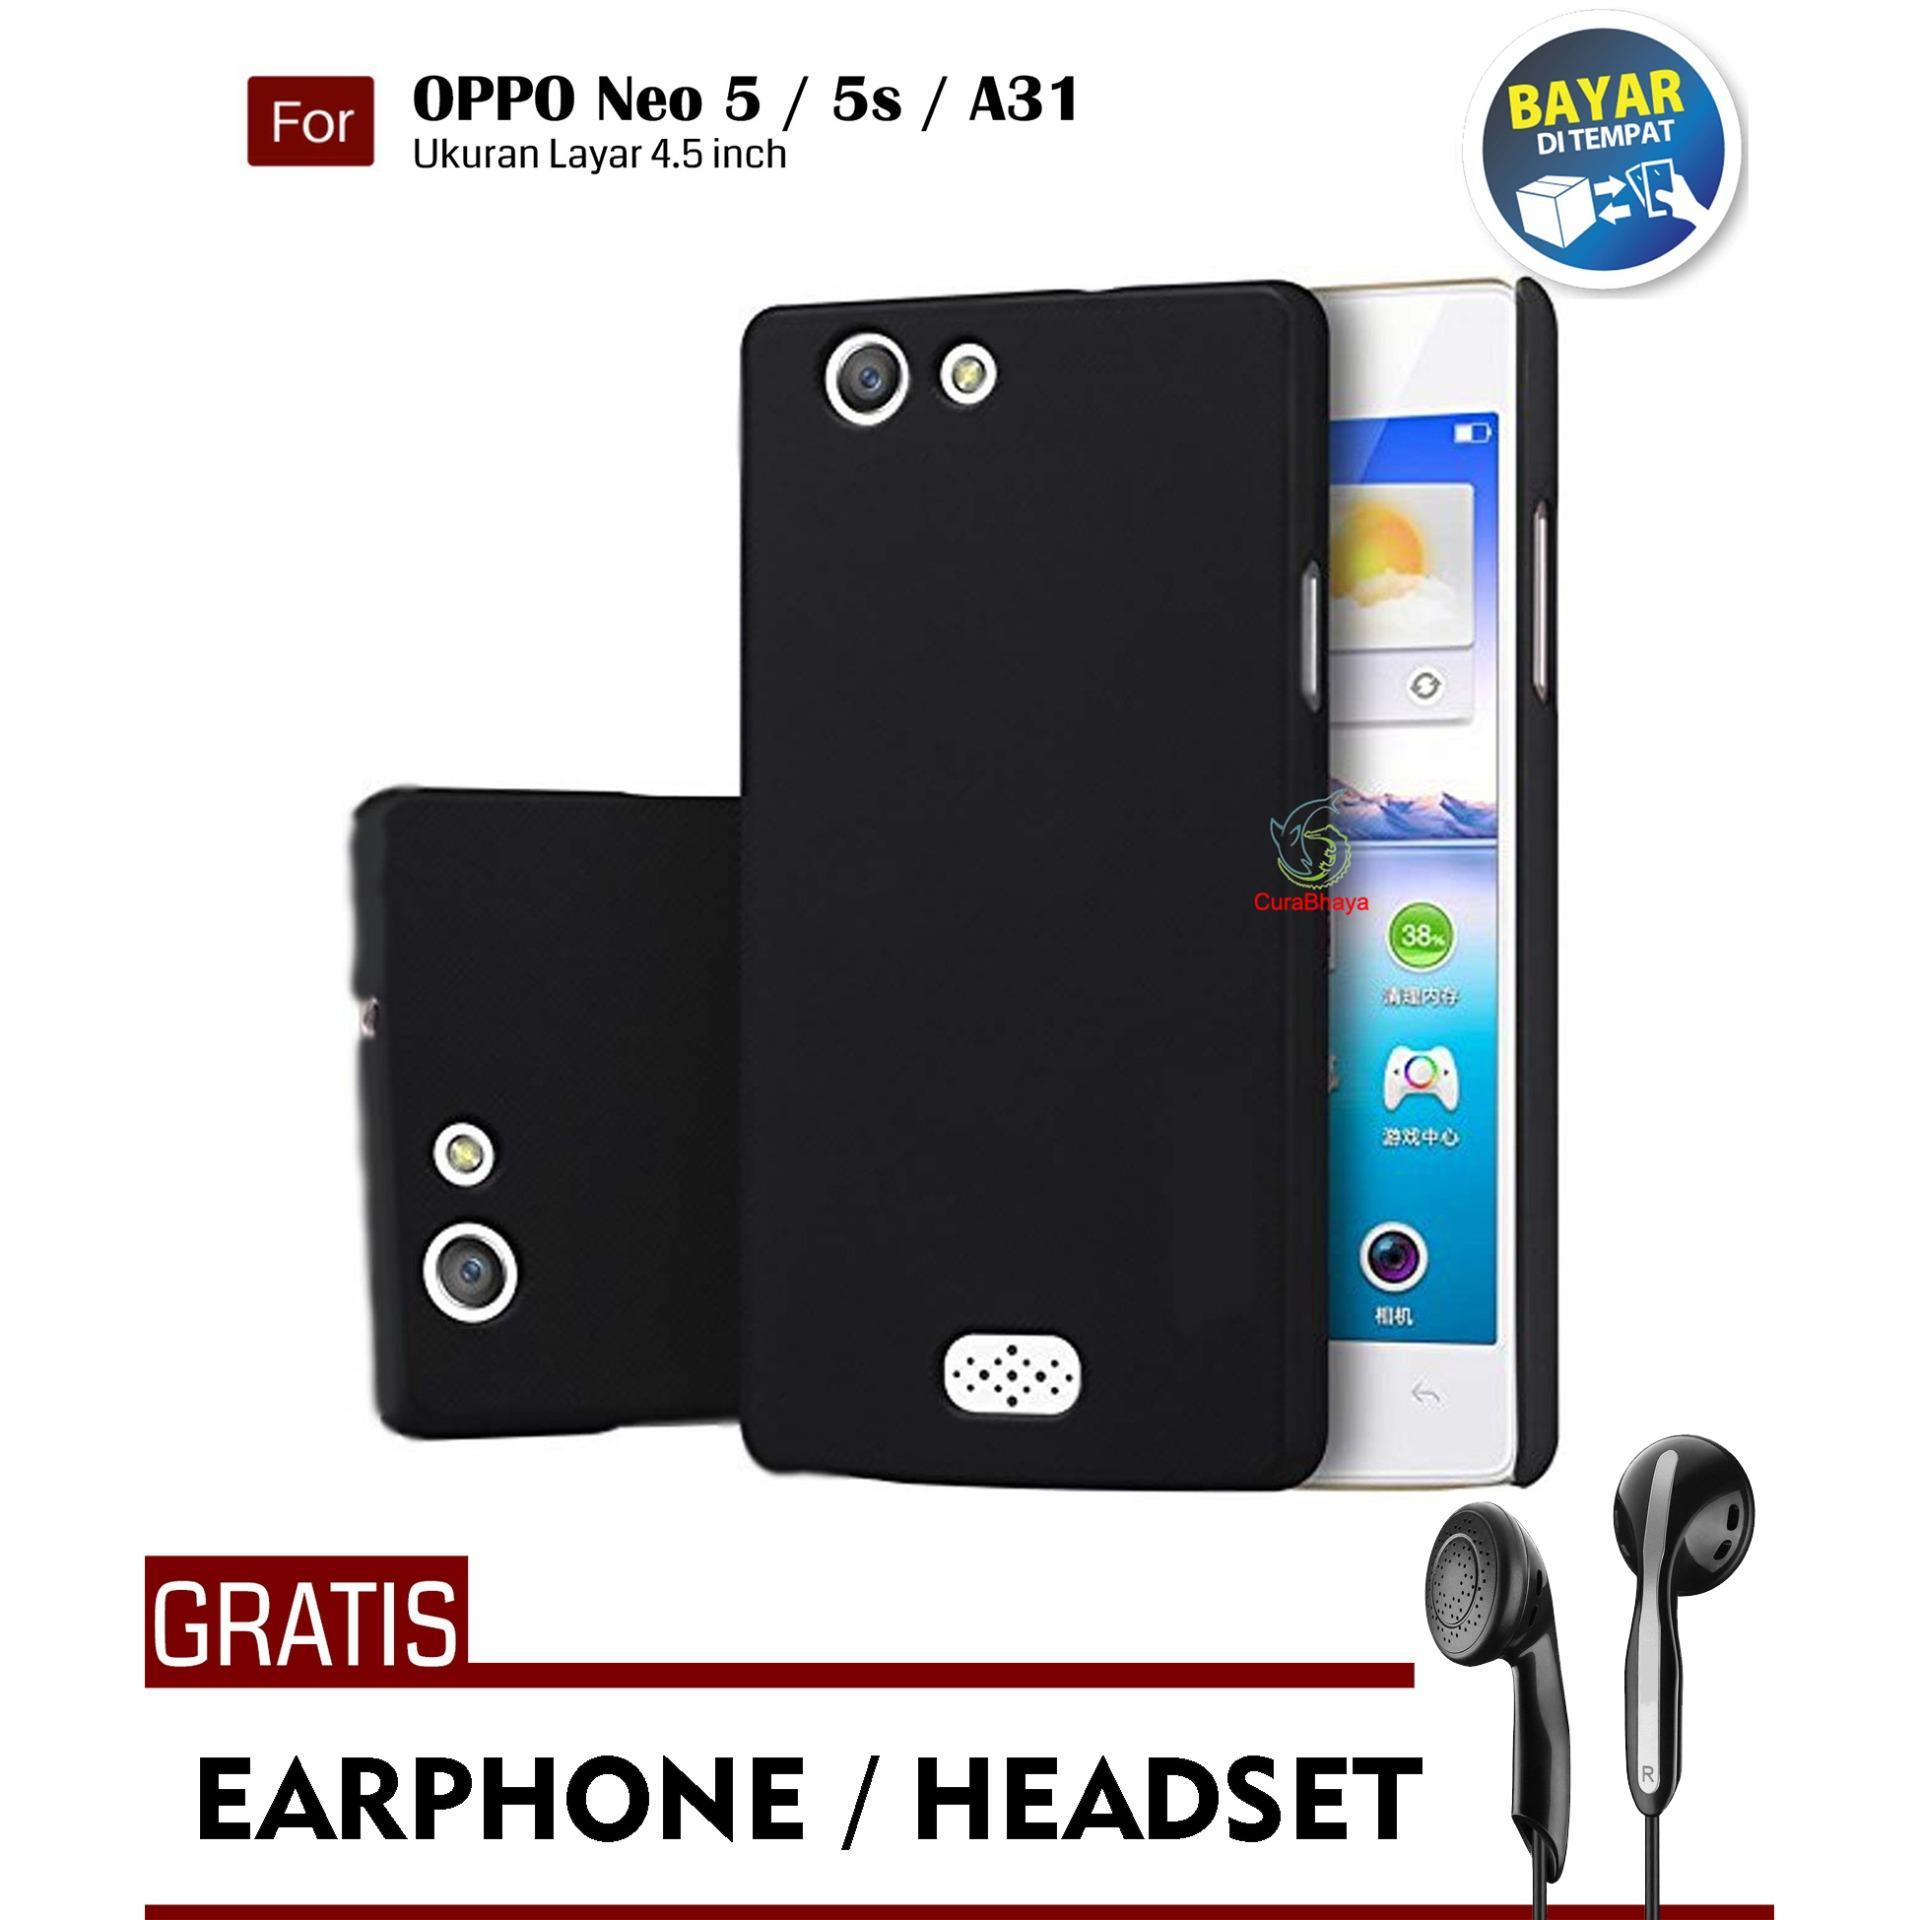 MidNight Oppo Neo 5 / 5s / A31 / A31T / A31S| Slim Case Black Matte Softcase Premium Baby Skin + Gratis Free Earphone Headset Handsfree